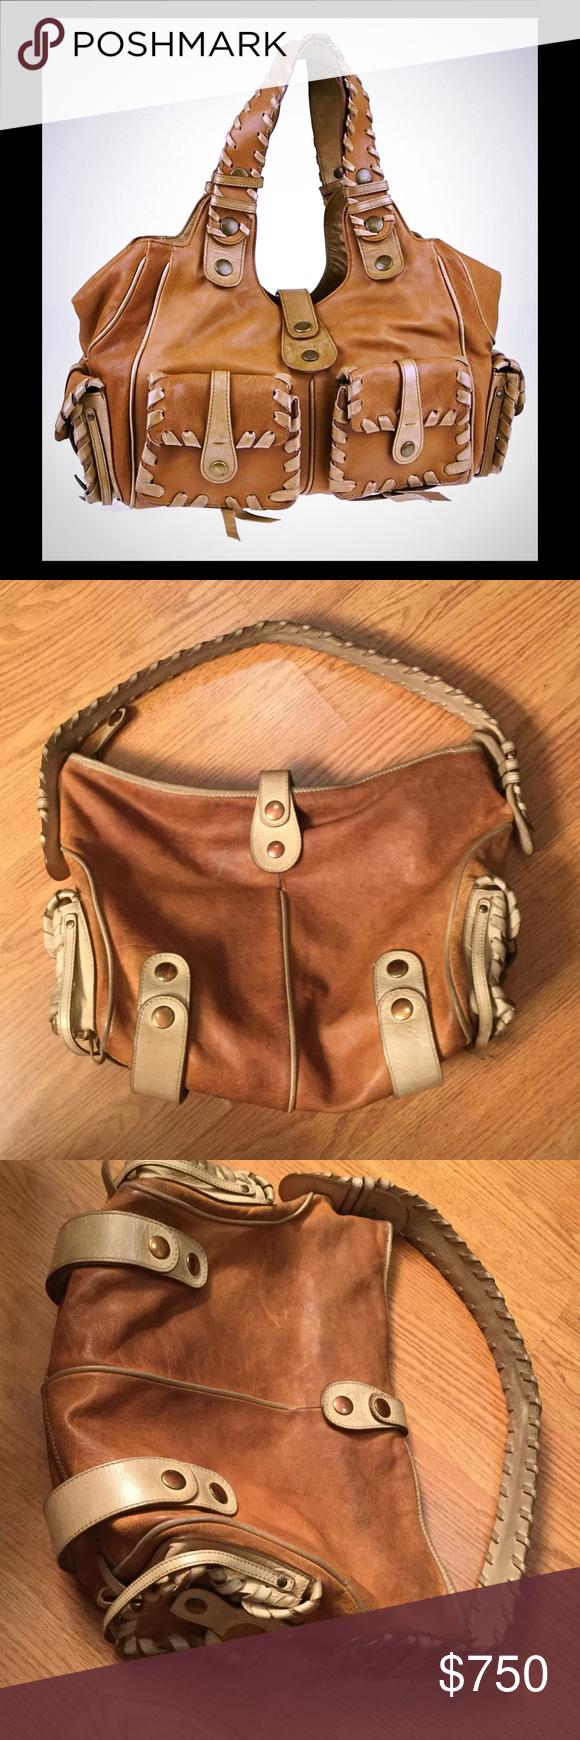 CHLOE tan leather Silverado bag Tan and ivory Chloe Silverado large leather bag classic and a celeb fav Chloe Bags